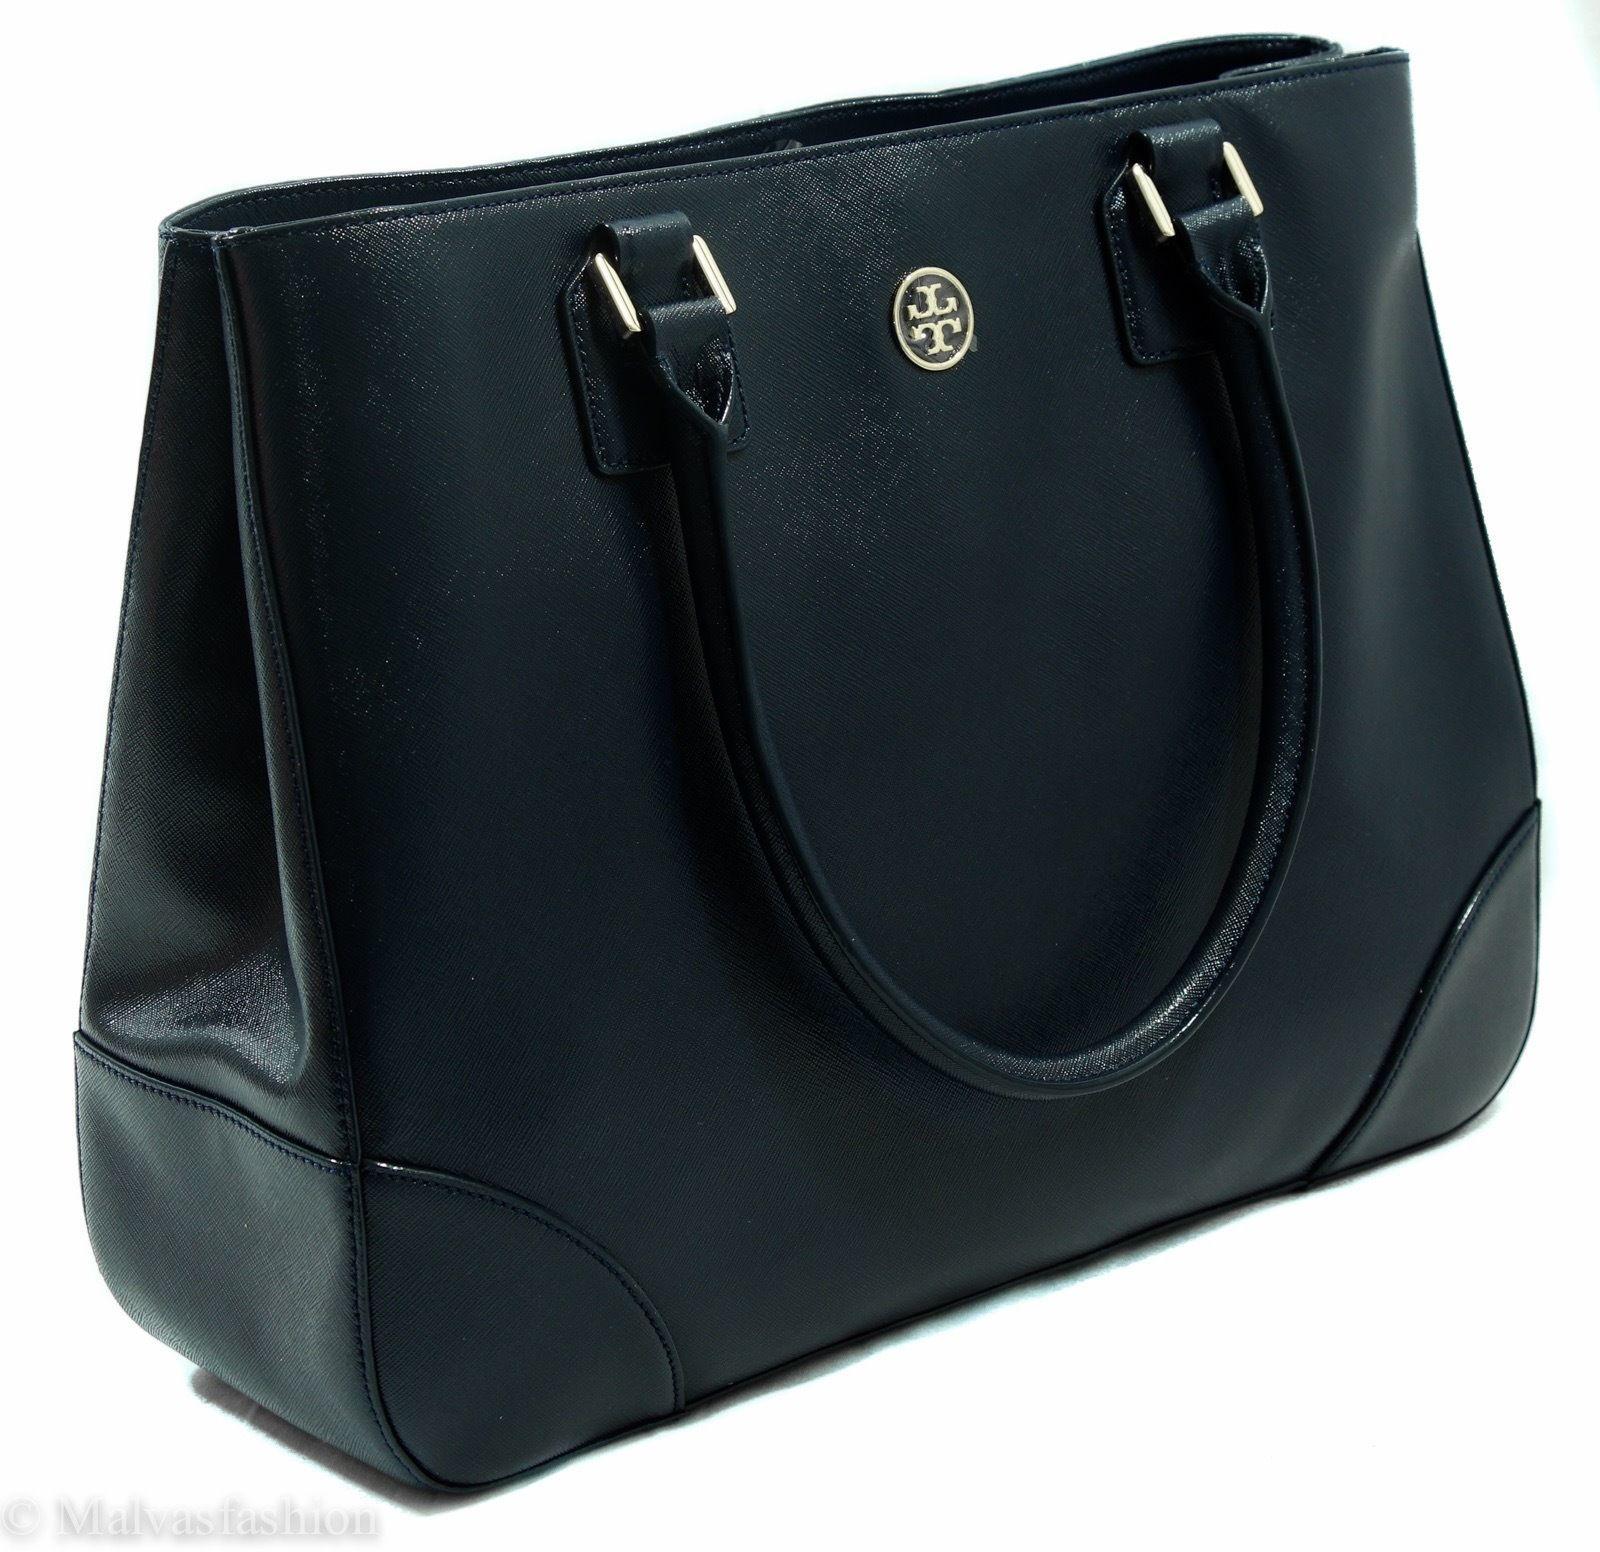 NWTTory Burch Robinson East/West Tote Handbag Bag, Blue image 3